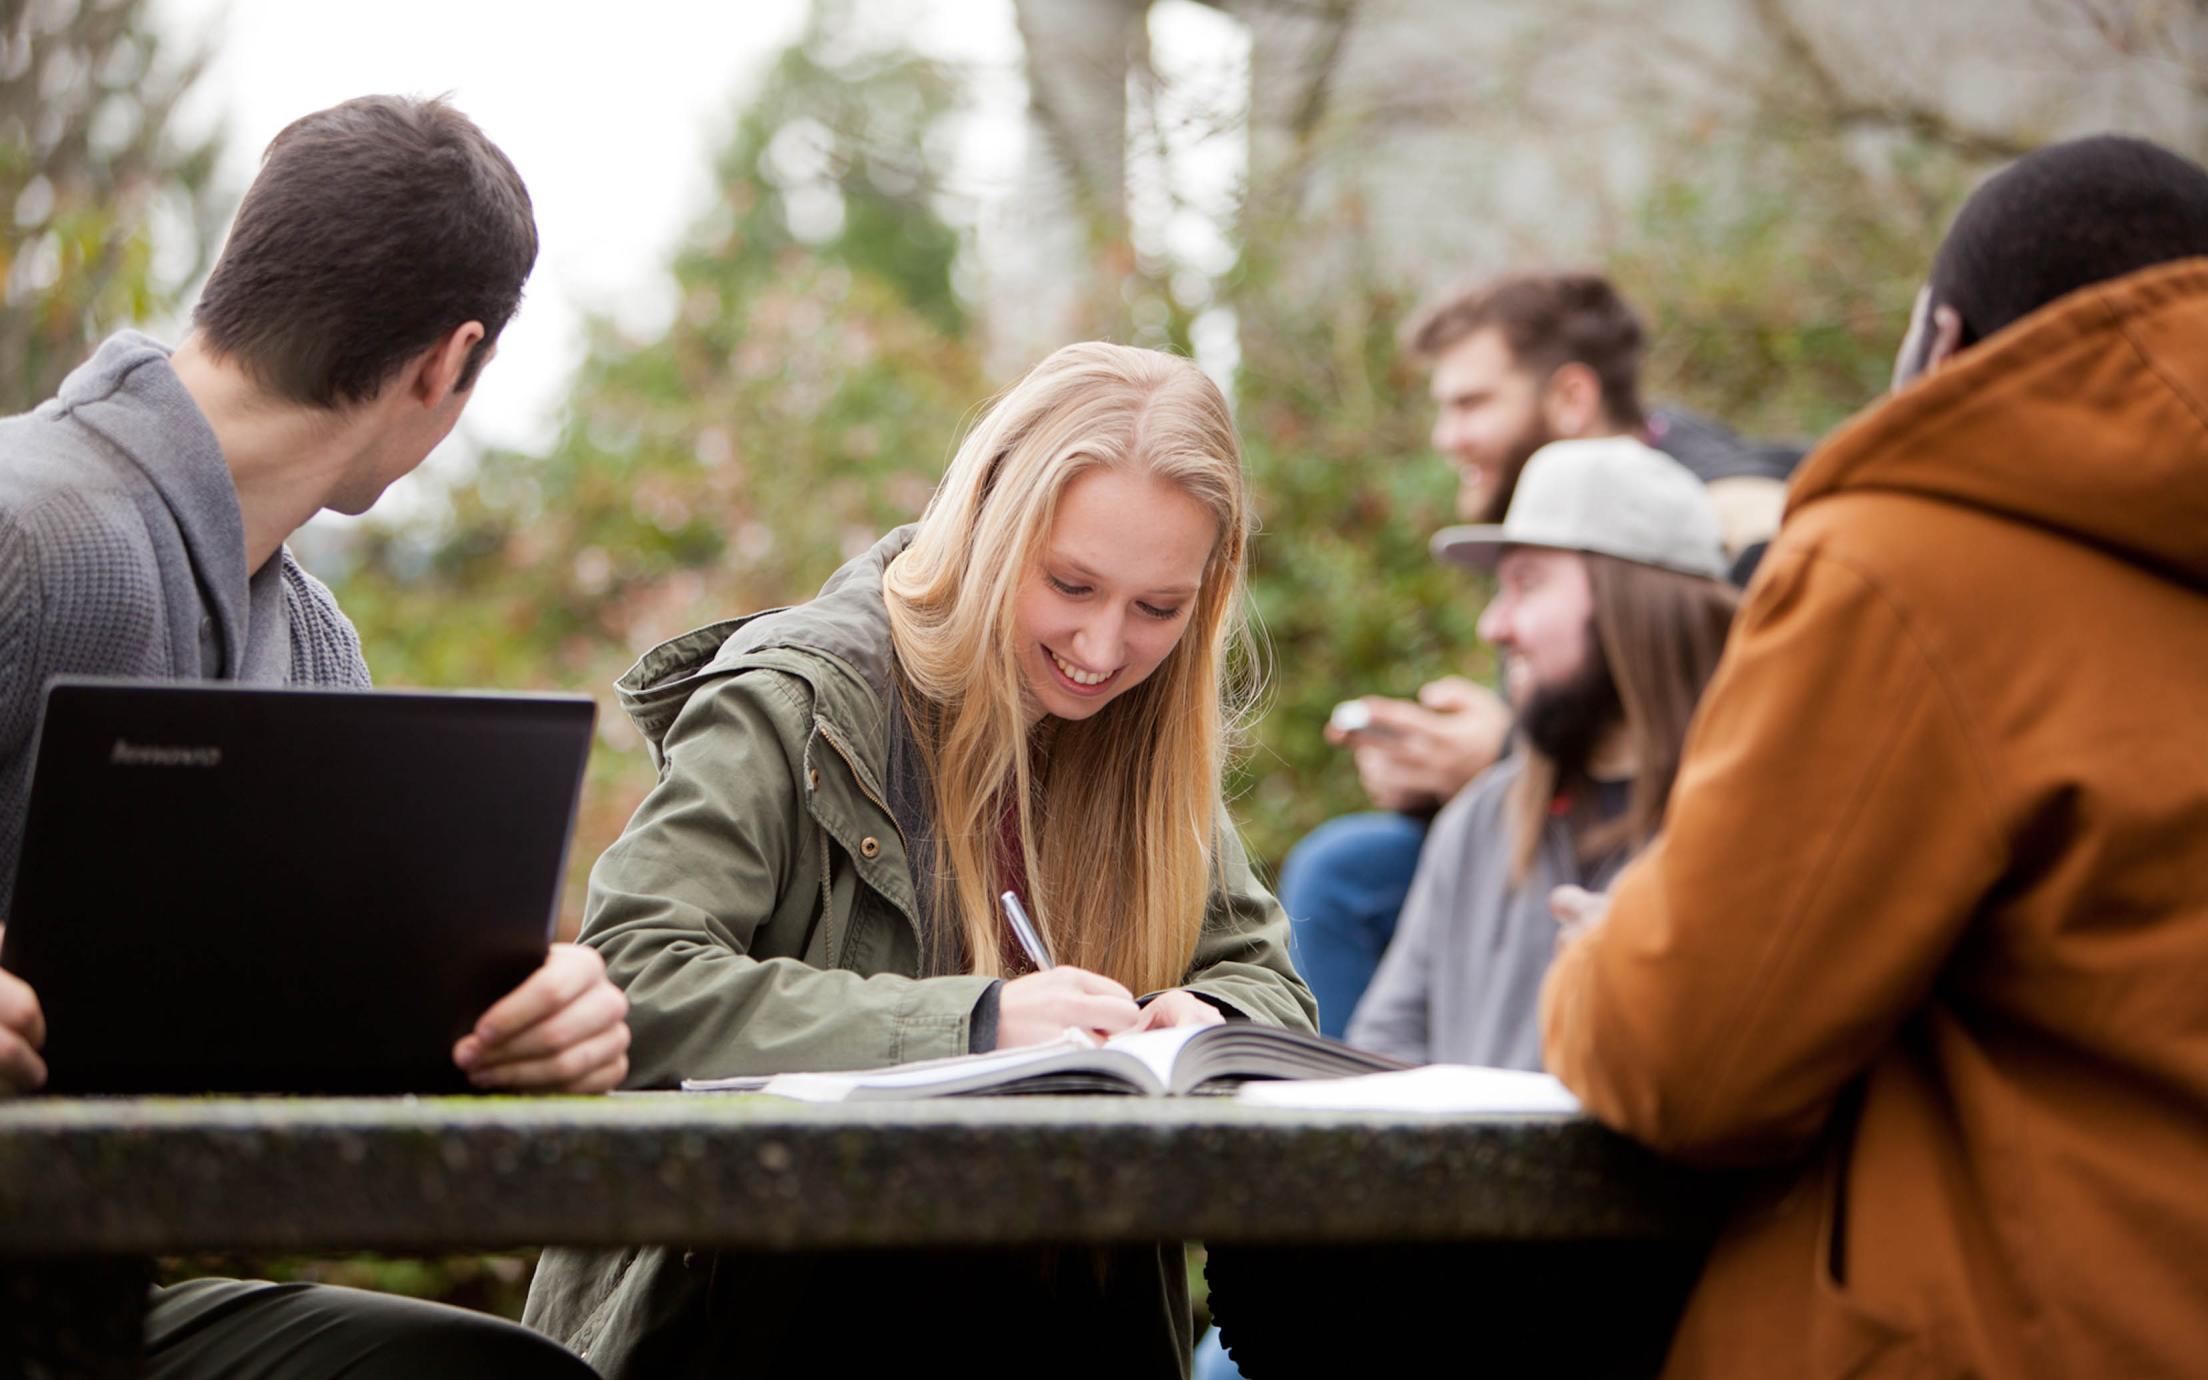 VIU's BBA Degree students